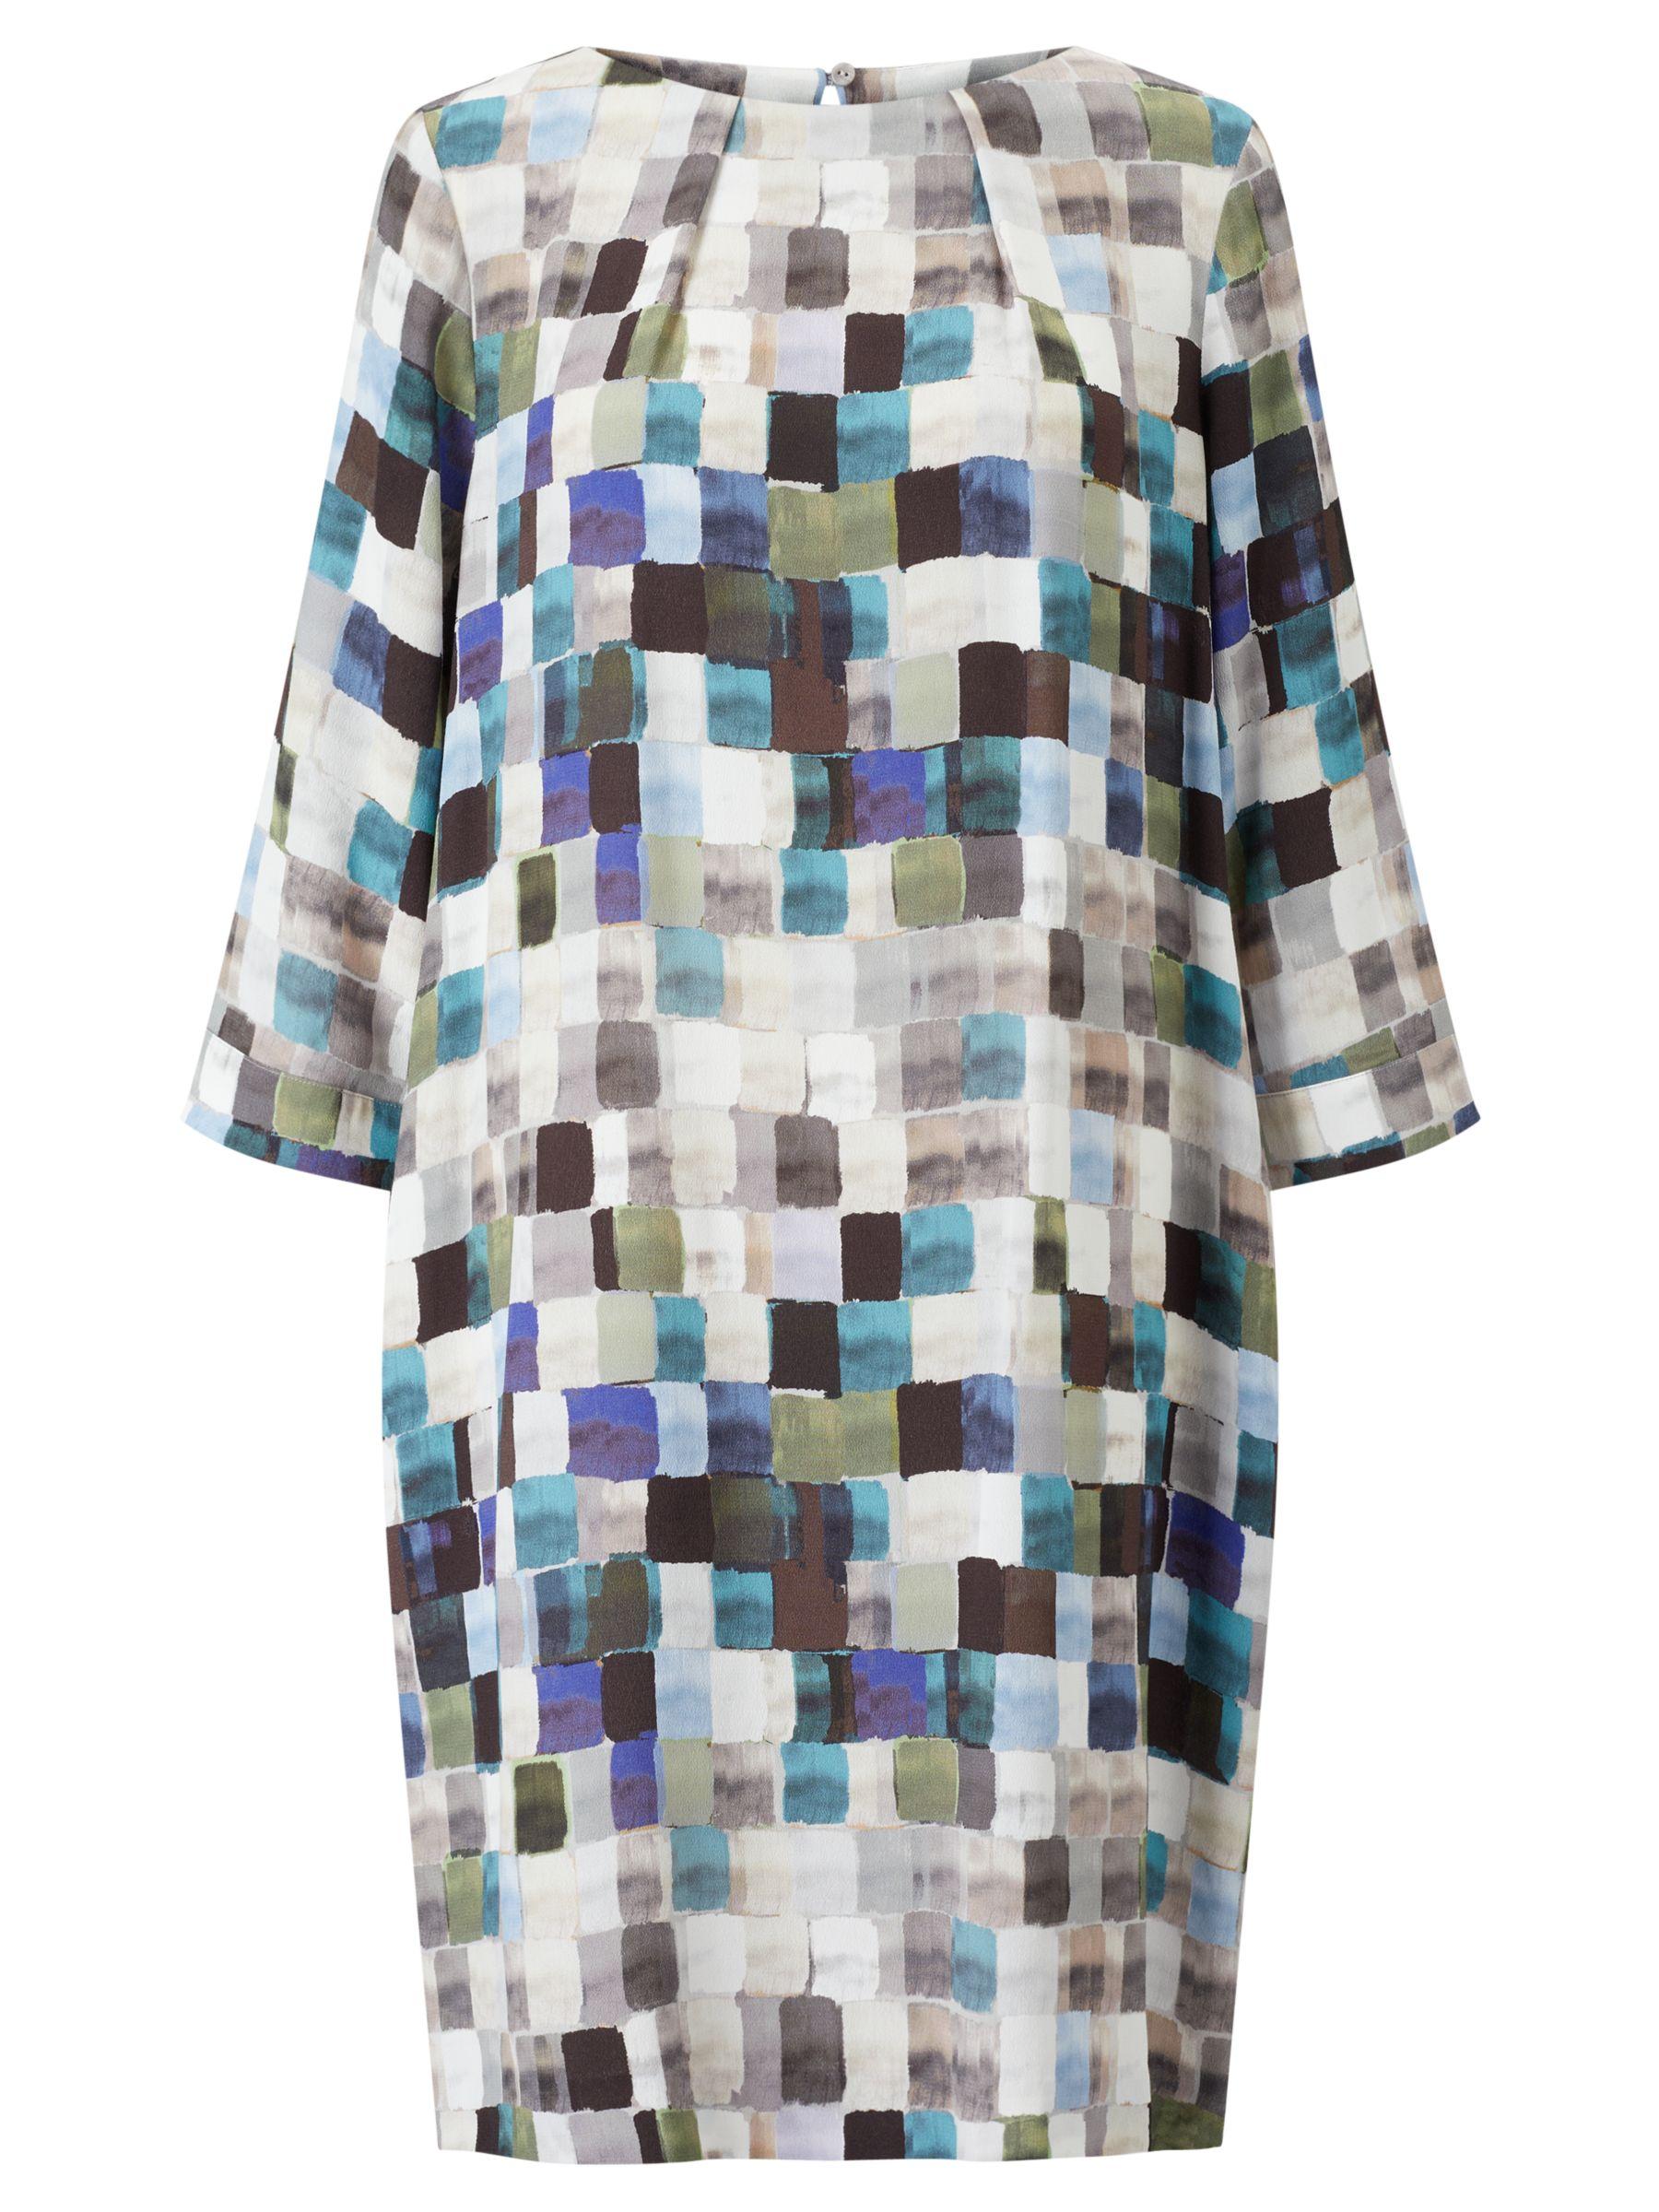 Kin by John Lewis Kin by John Lewis Painted Square Print Dress